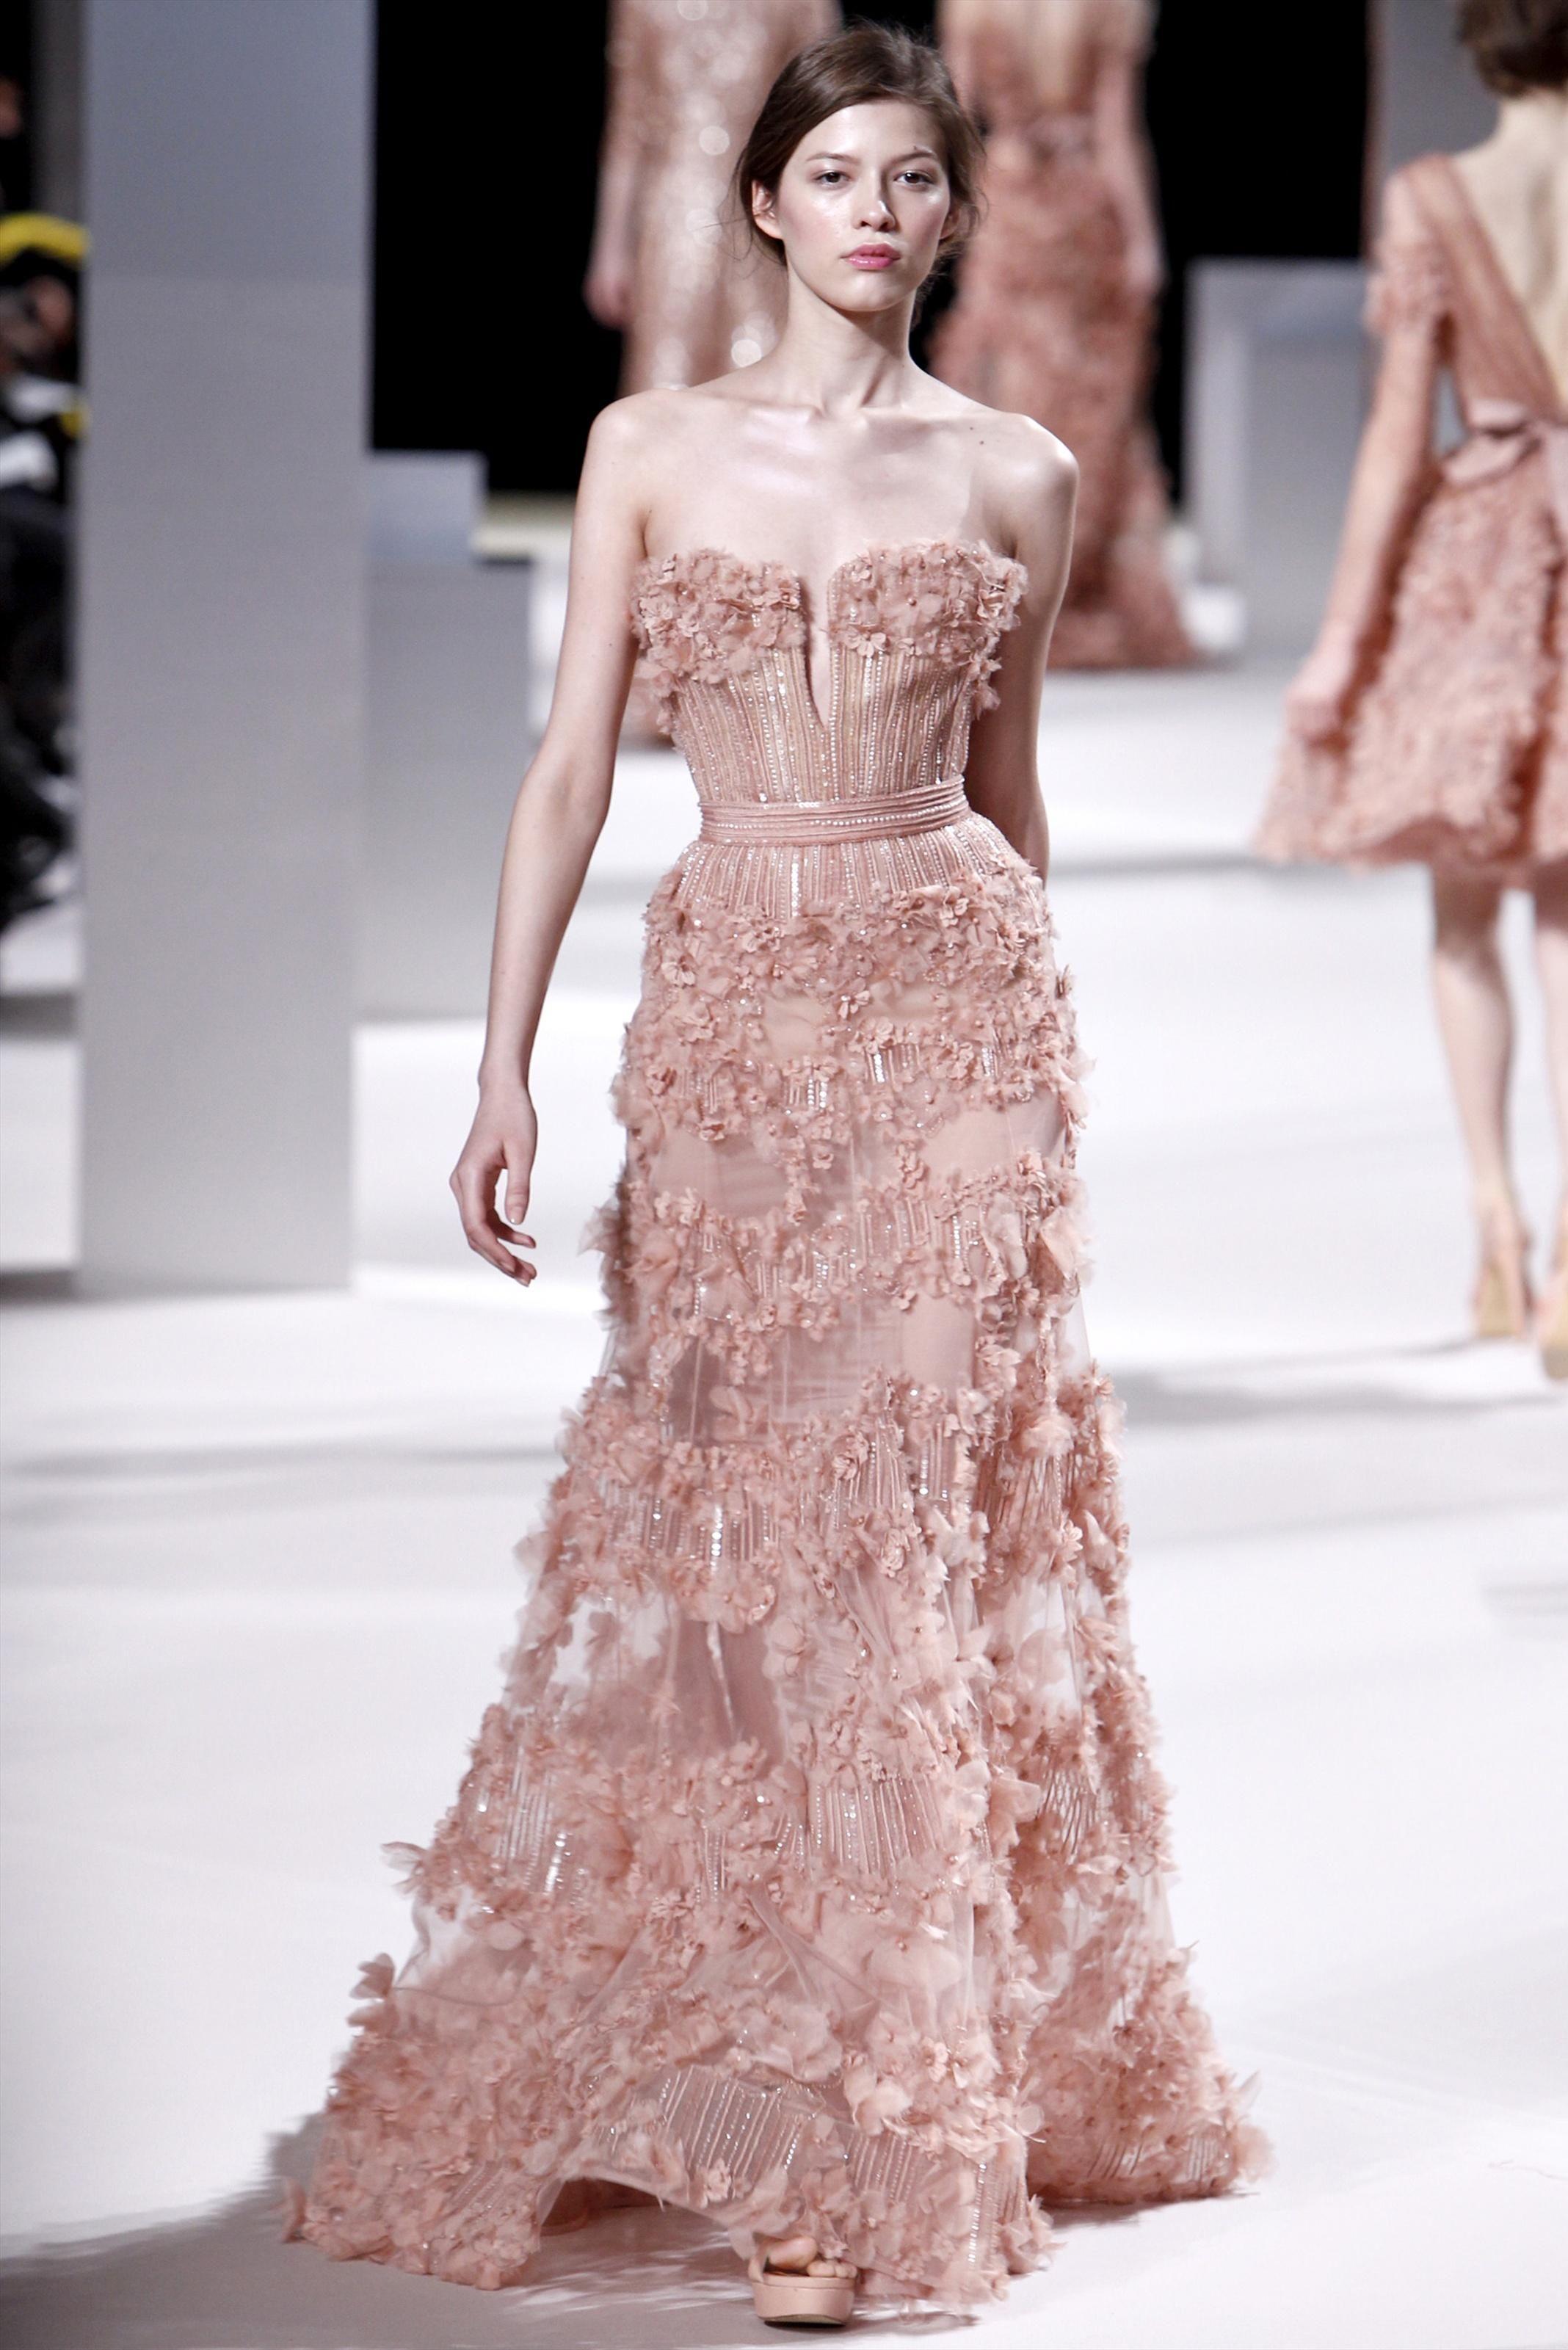 Elie Saab | Catwalk Moments | Pinterest | Vestidos de noche, Moda ...